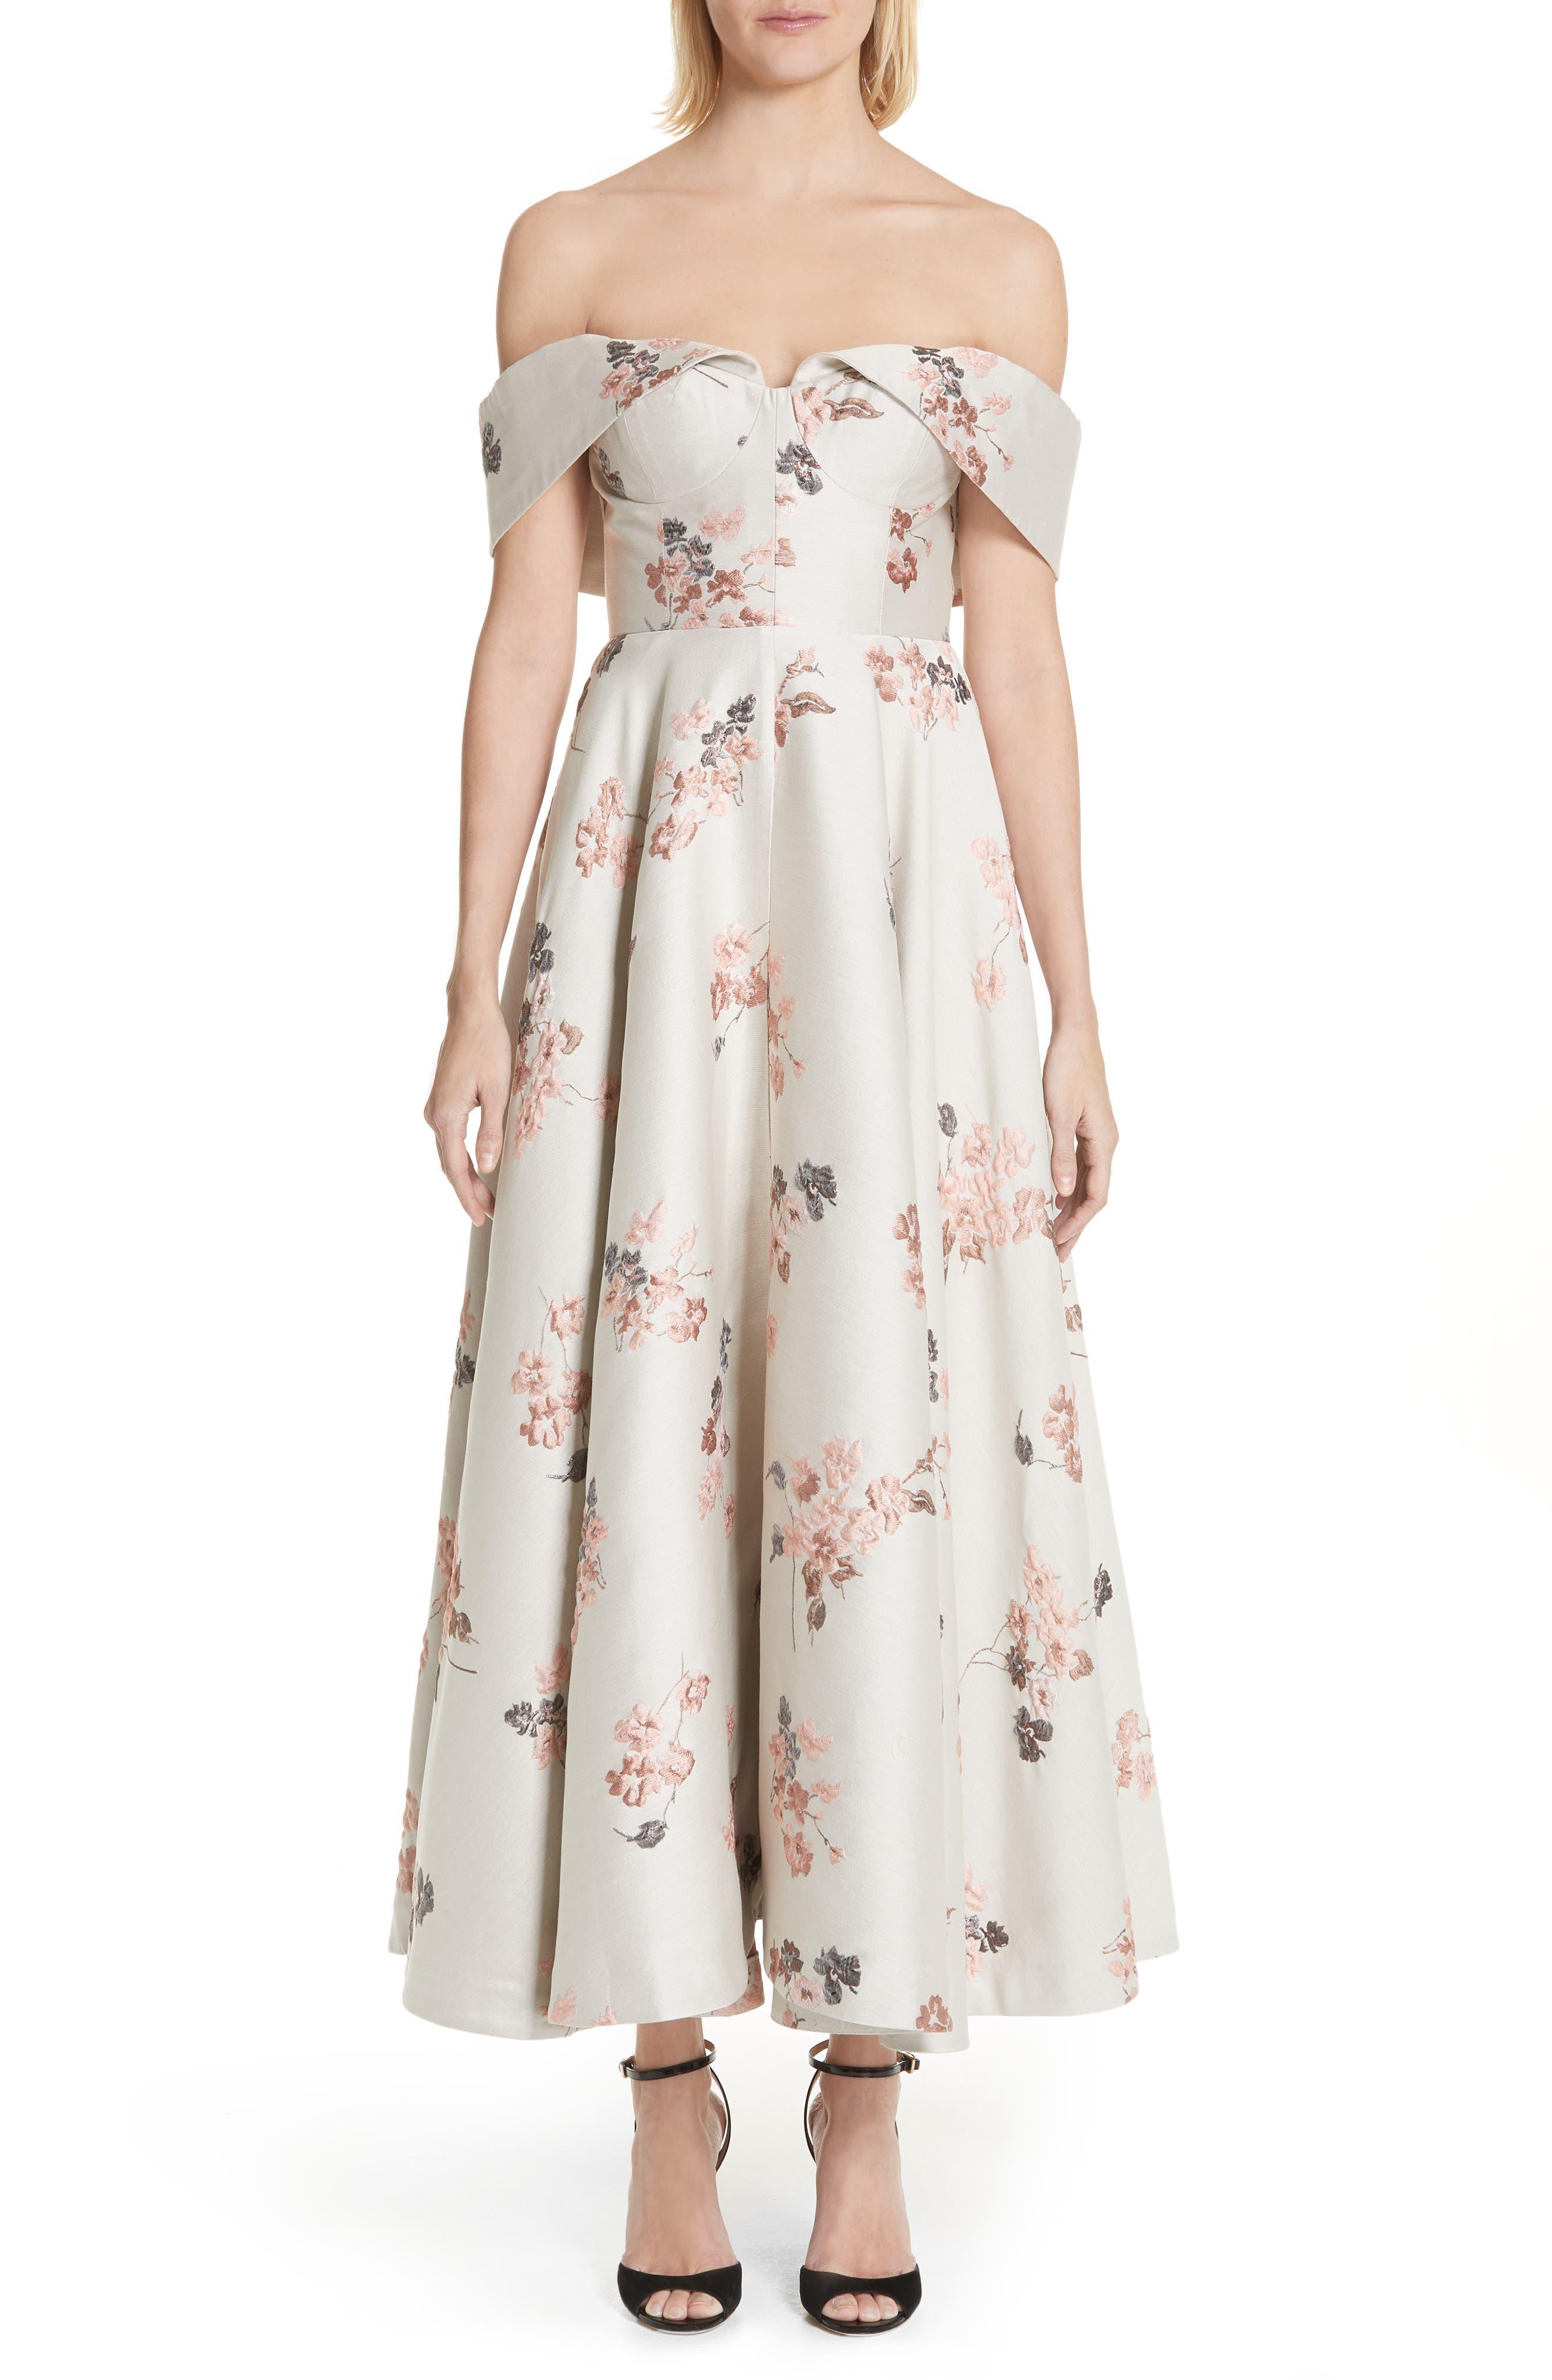 Metallic Floral Jacquard Off the Shoulder Dress,                             Main thumbnail 1, color,                             Beige/ Pink